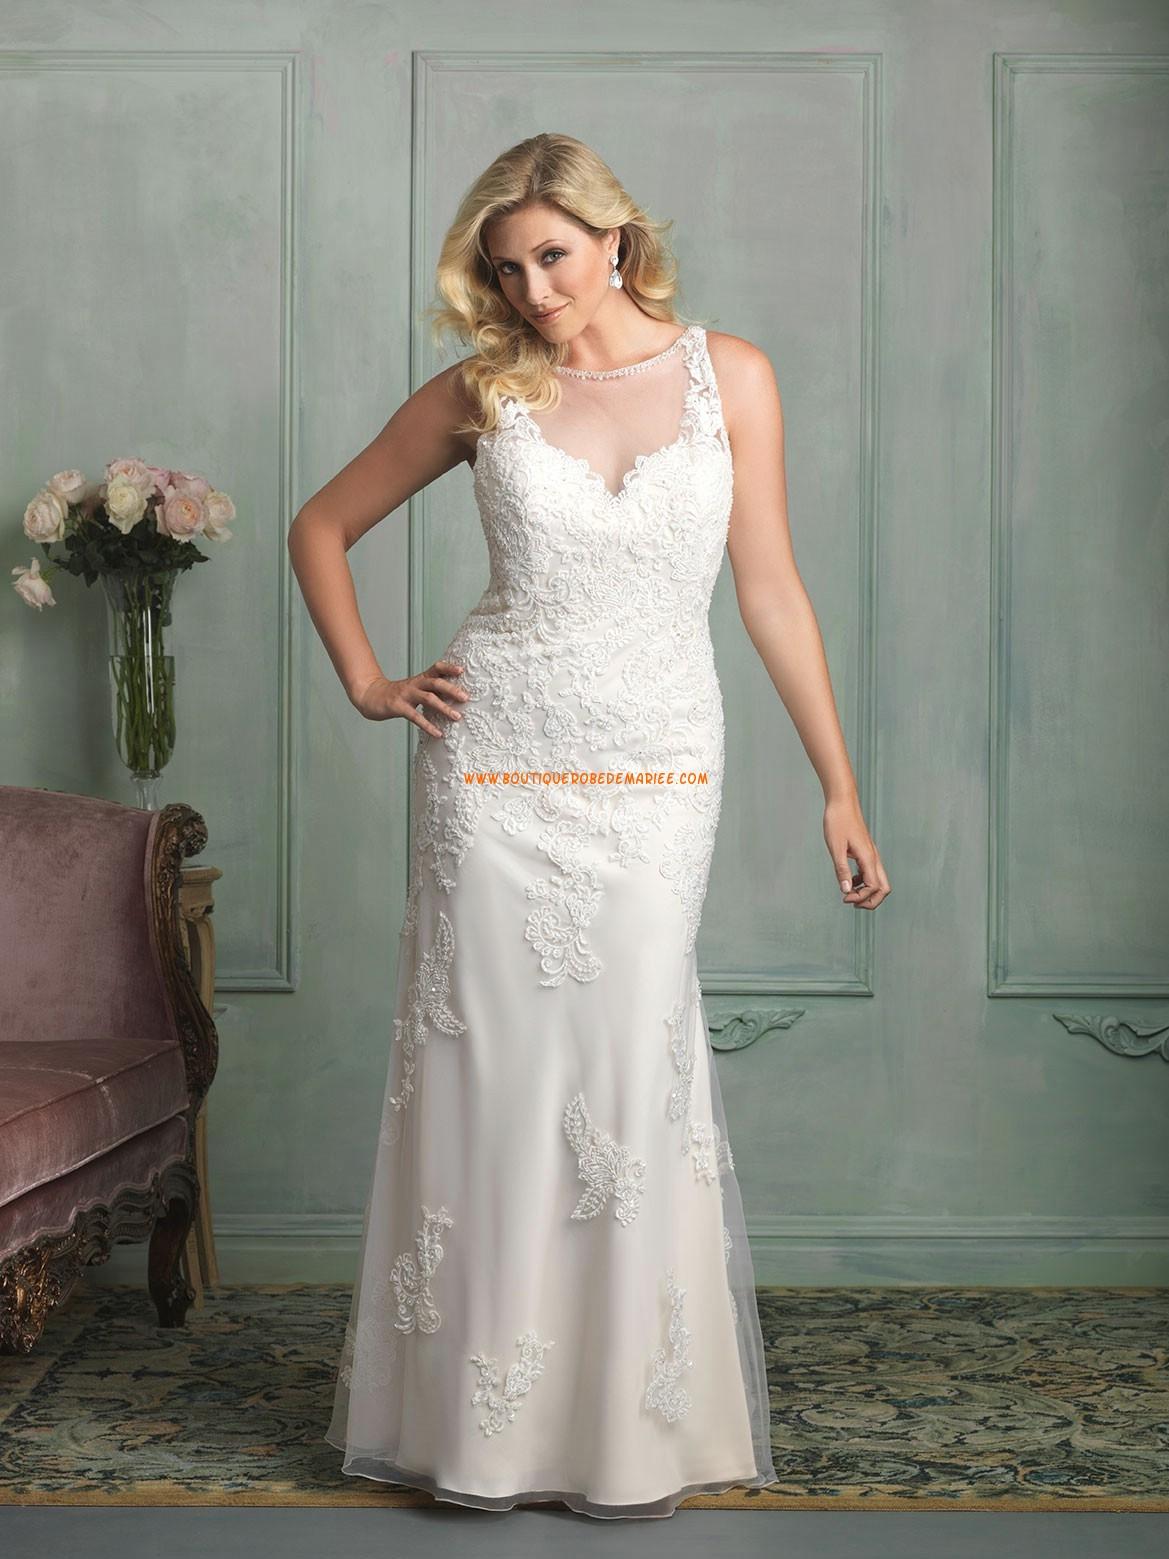 comment choisir sa robe de mari e beauteronde